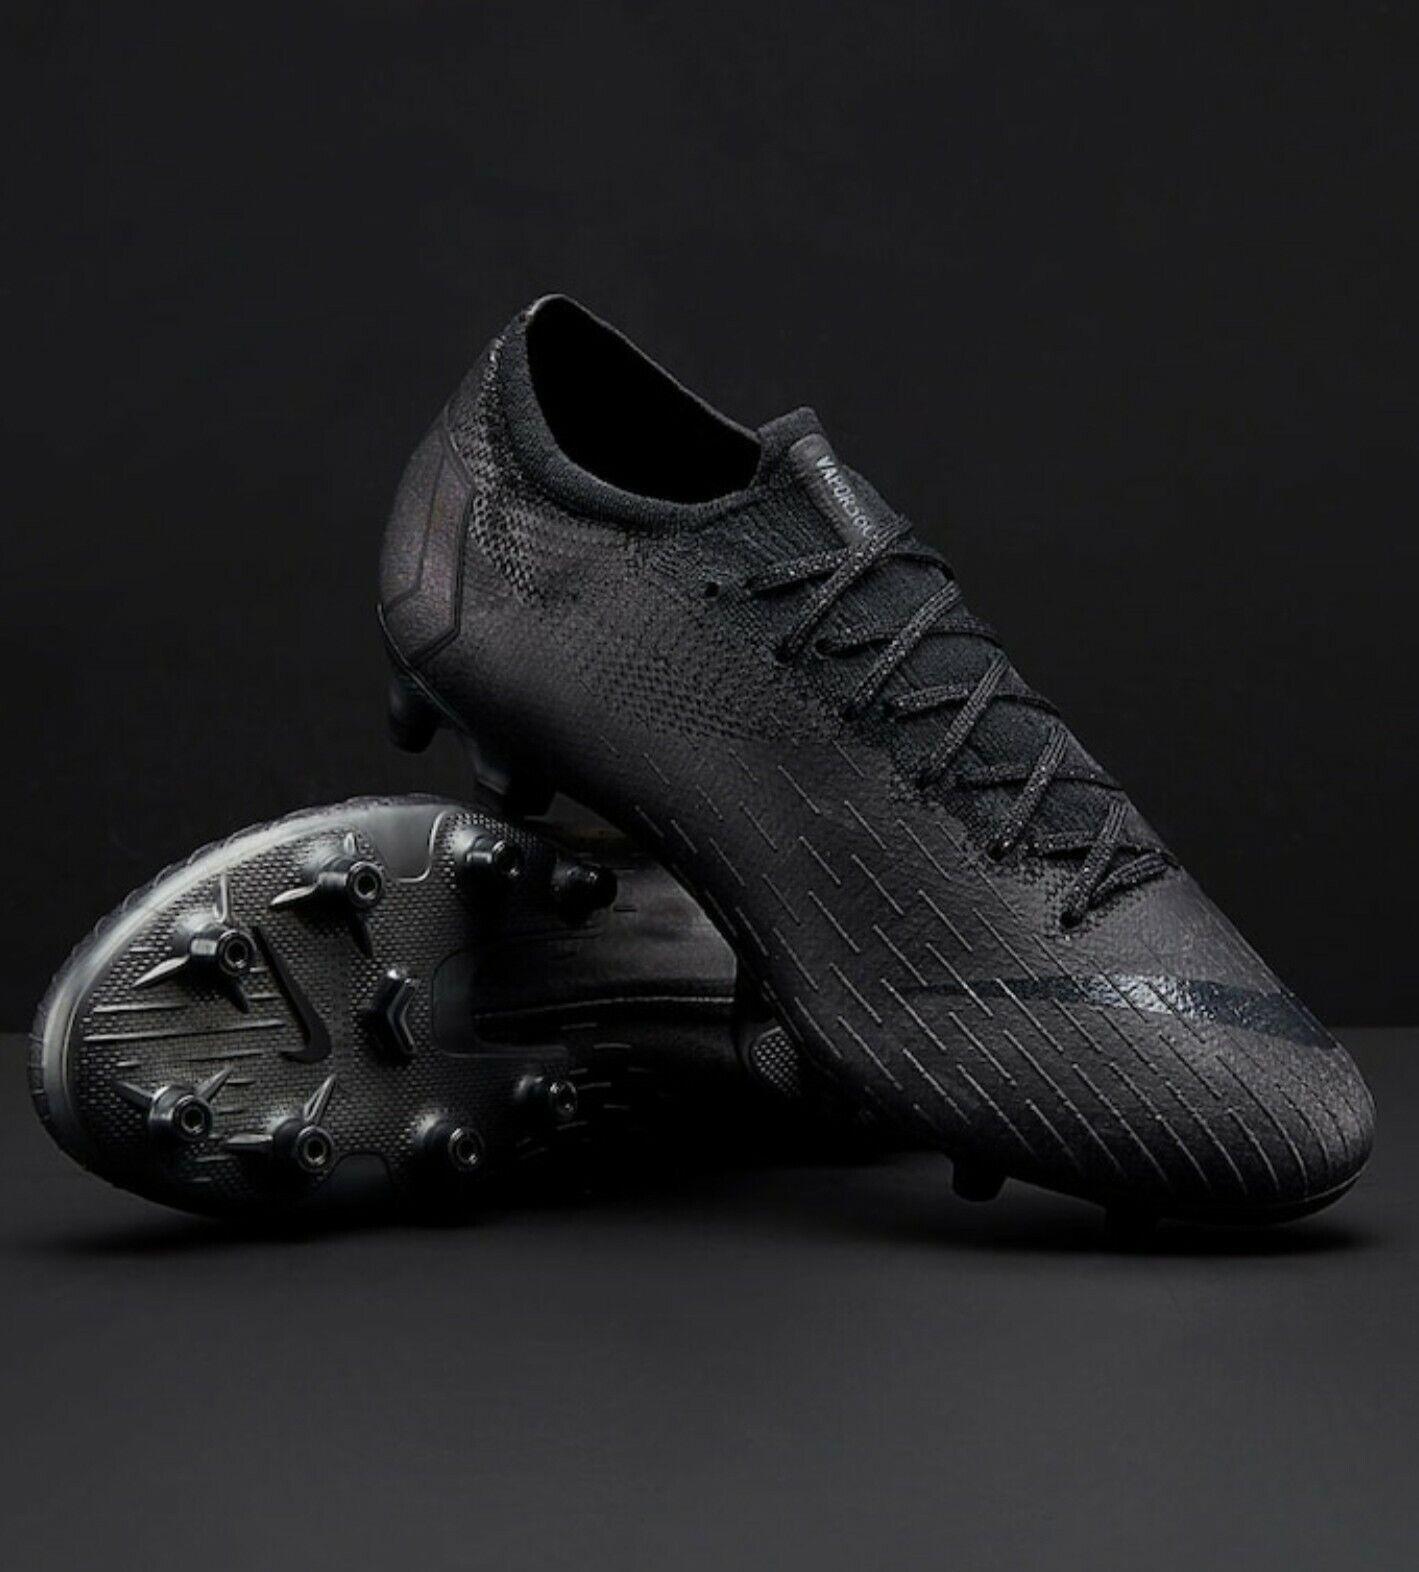 Nike Mercurial Vapor 12 elite ag-Pro-AH7379 001